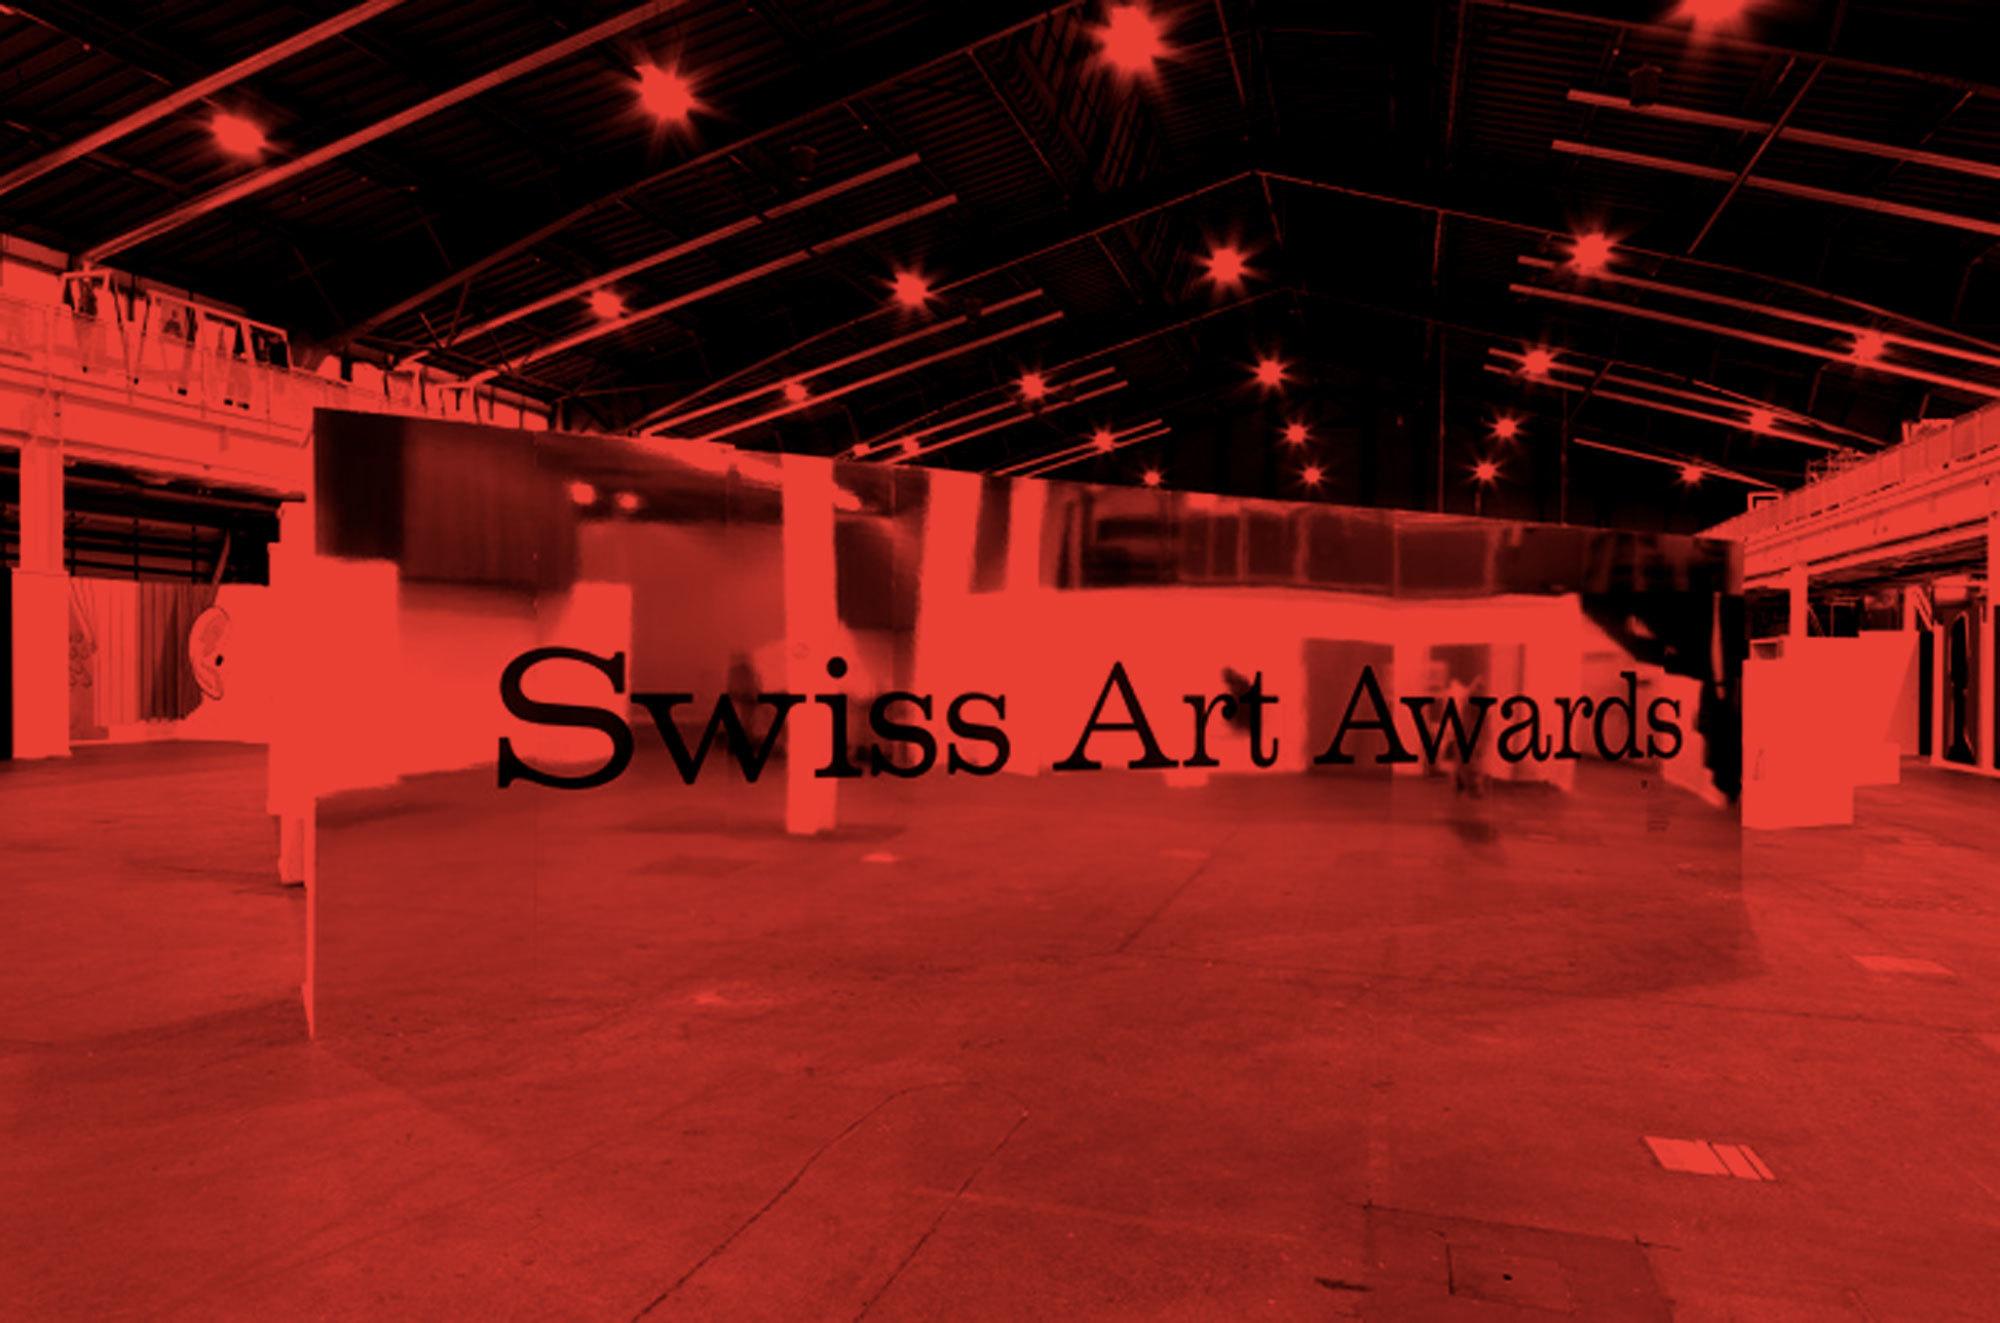 Swiss Art Awards - Art Basel